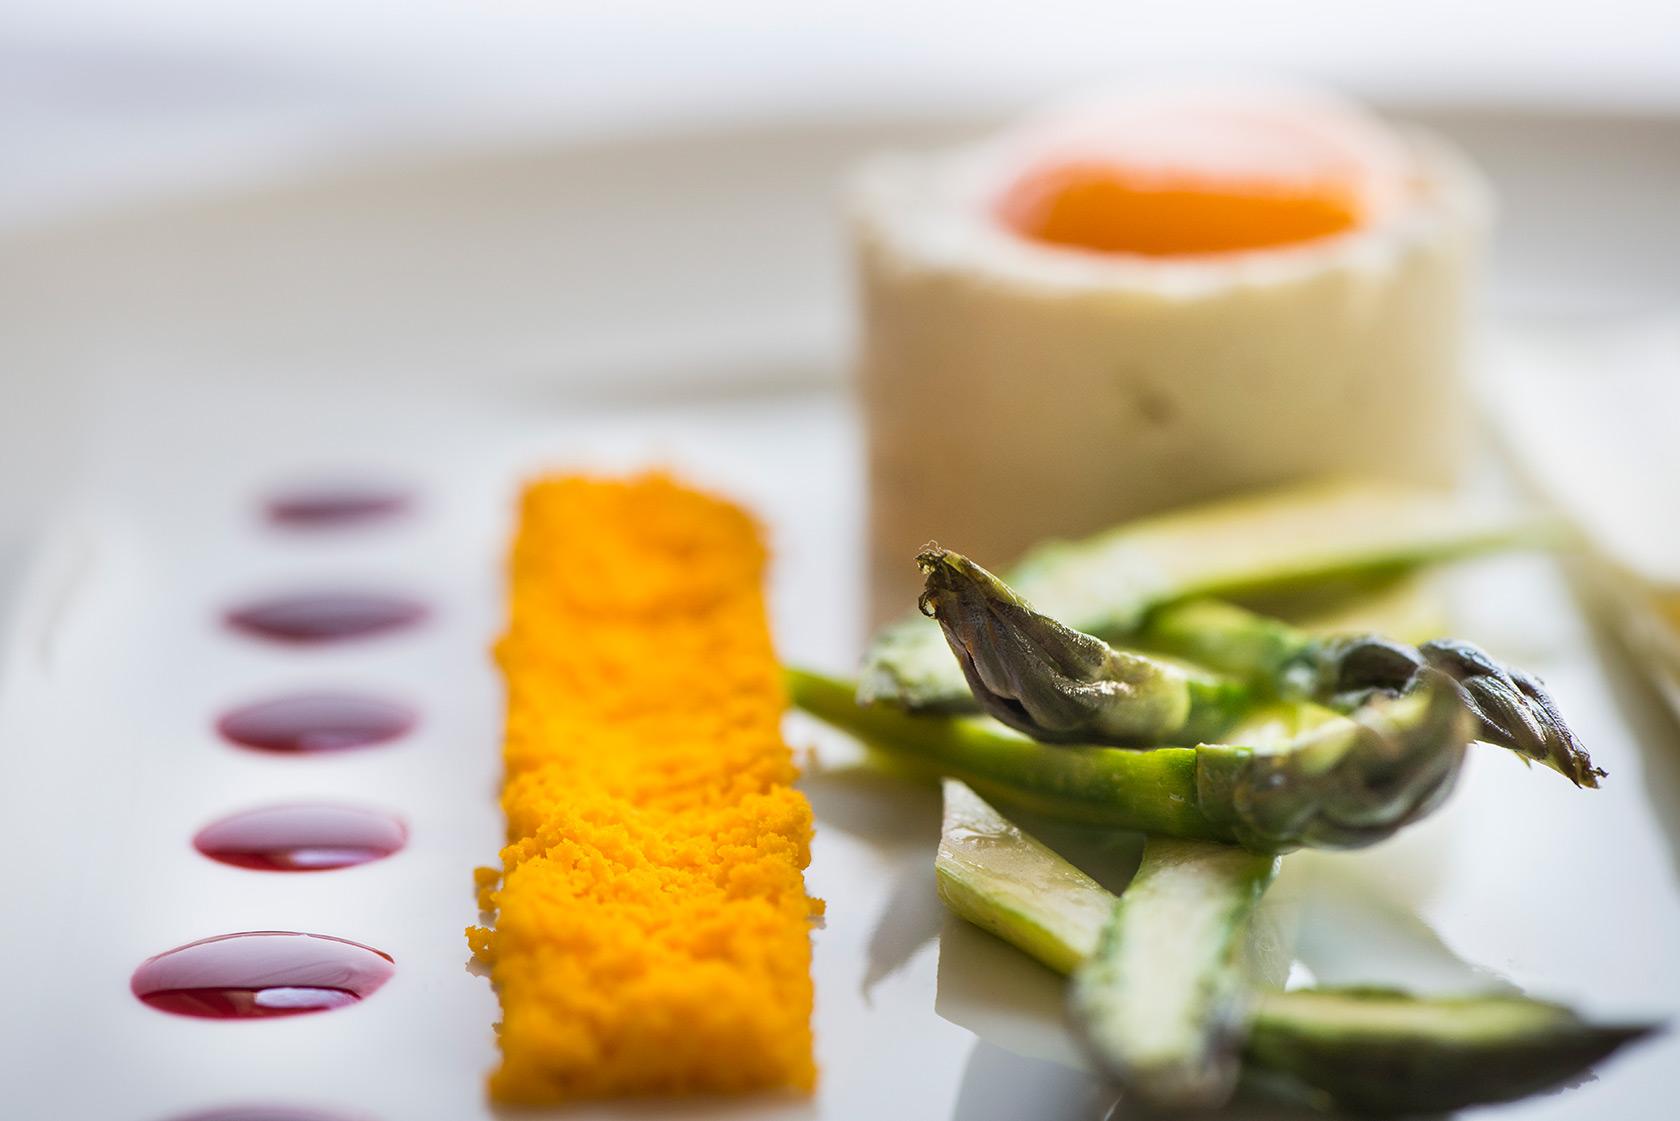 arnolfo-ristorante-asparagi-uova-gaetano-trovato-chef